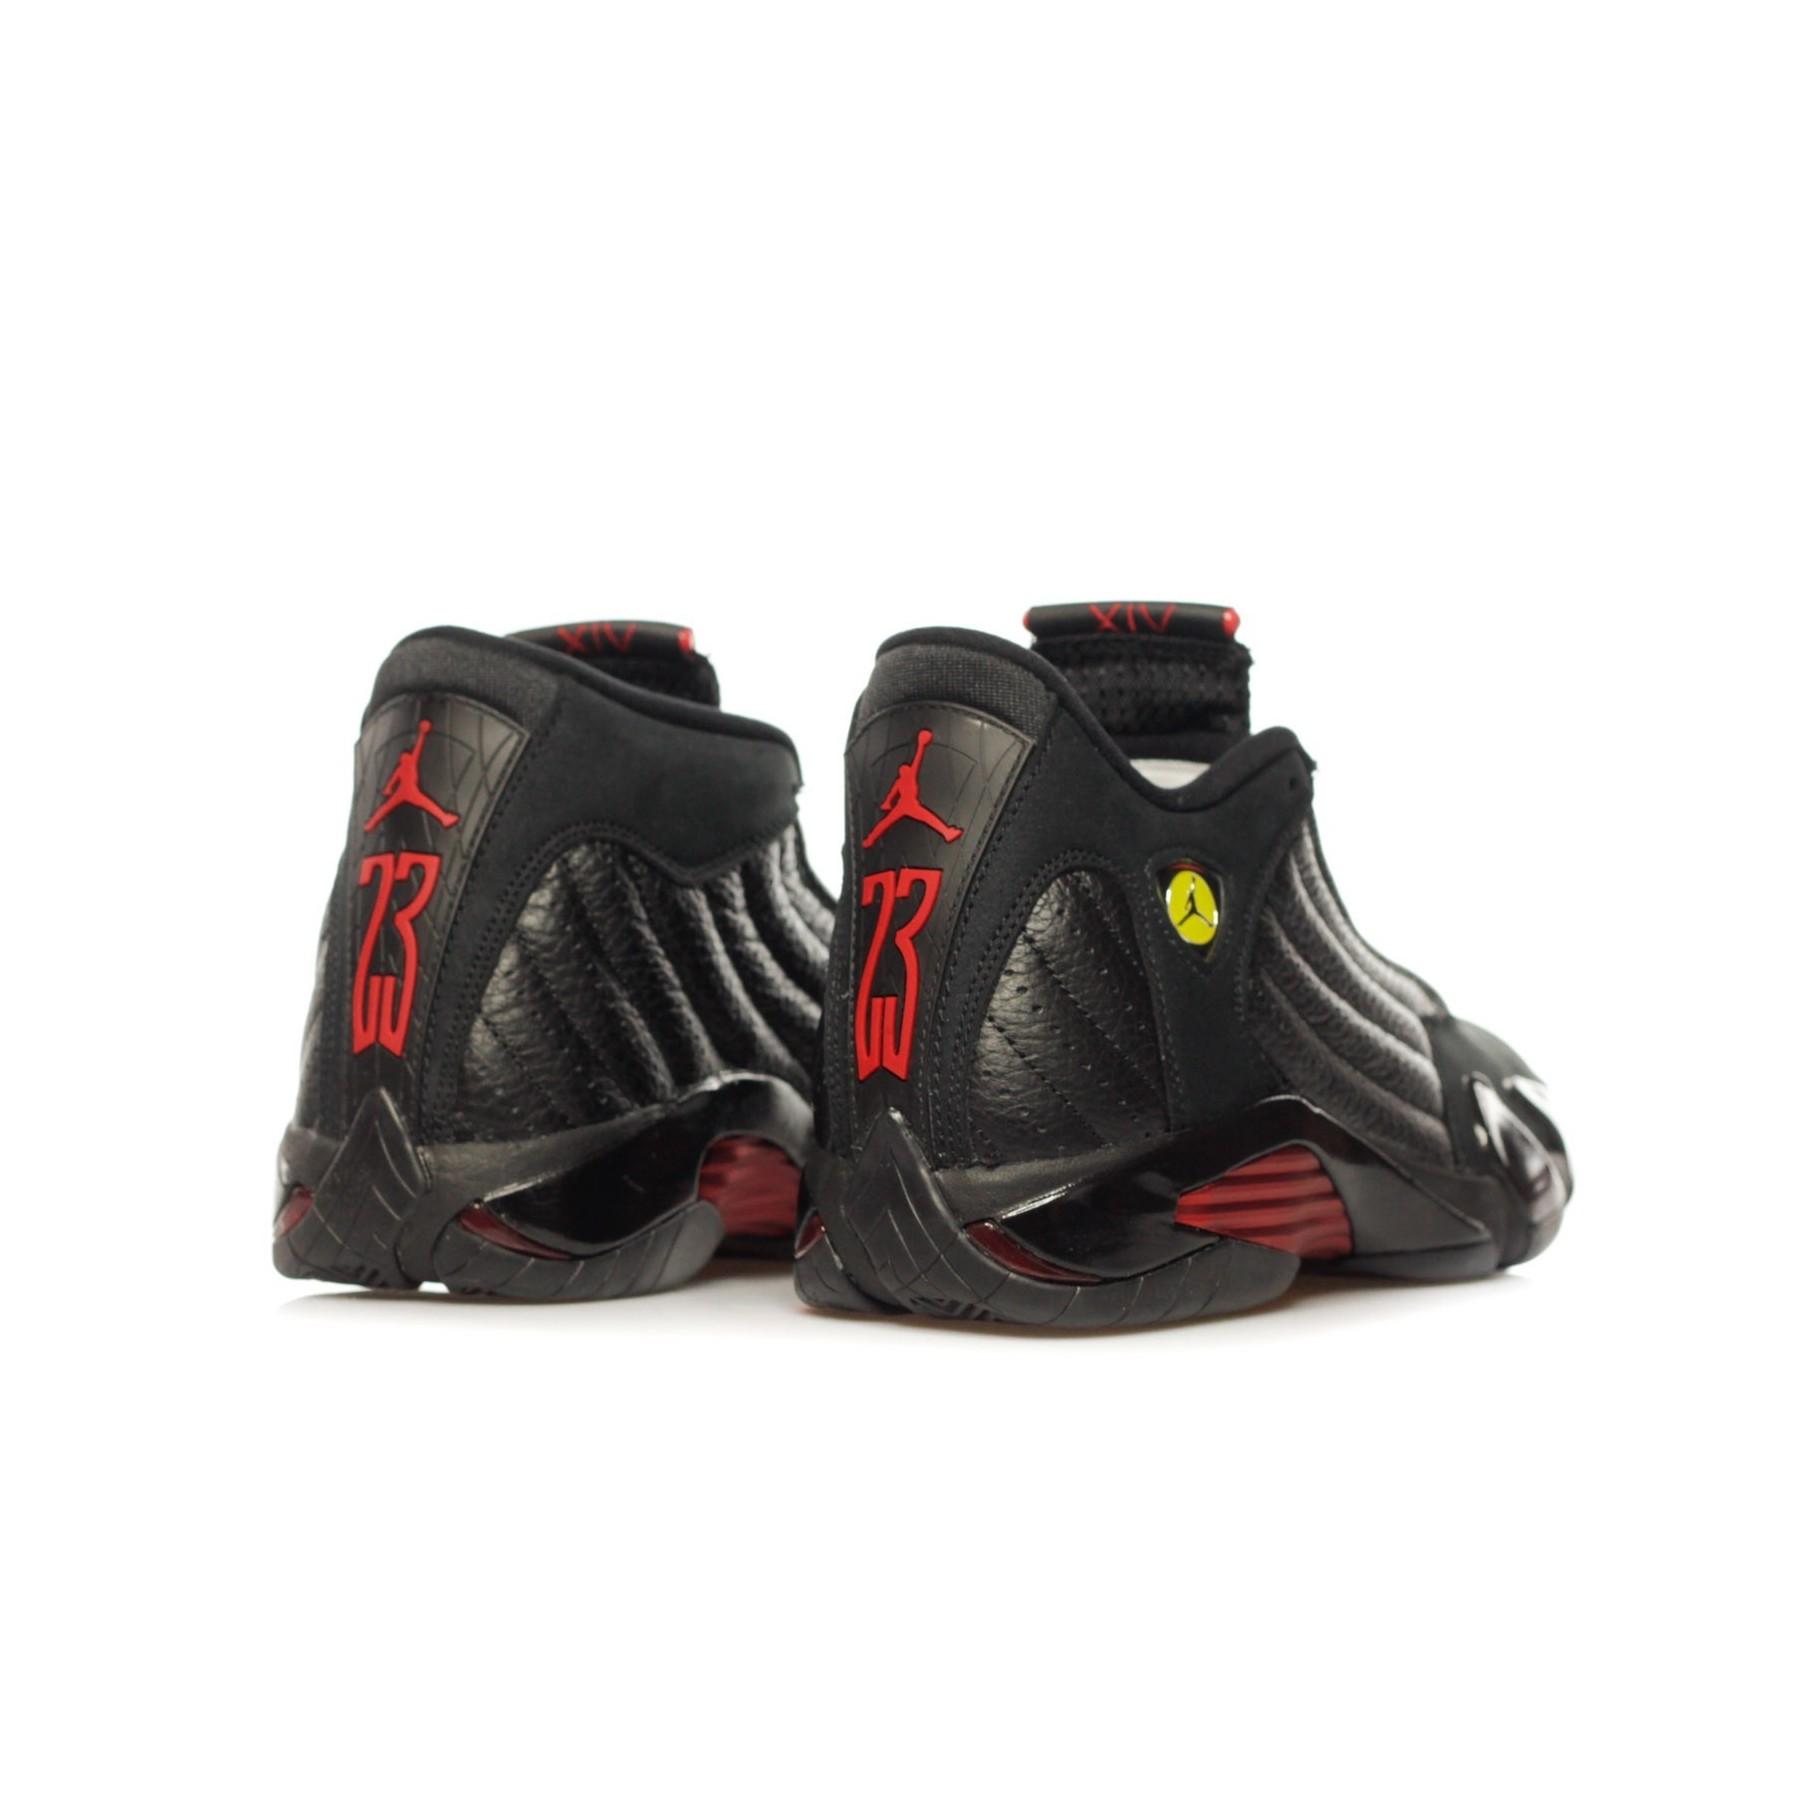 wholesale dealer da083 7fd24 HIGH SHOE AIR JORDAN 14 RETRO LAST SHOT BLACK/VARSITY RED/BLACK